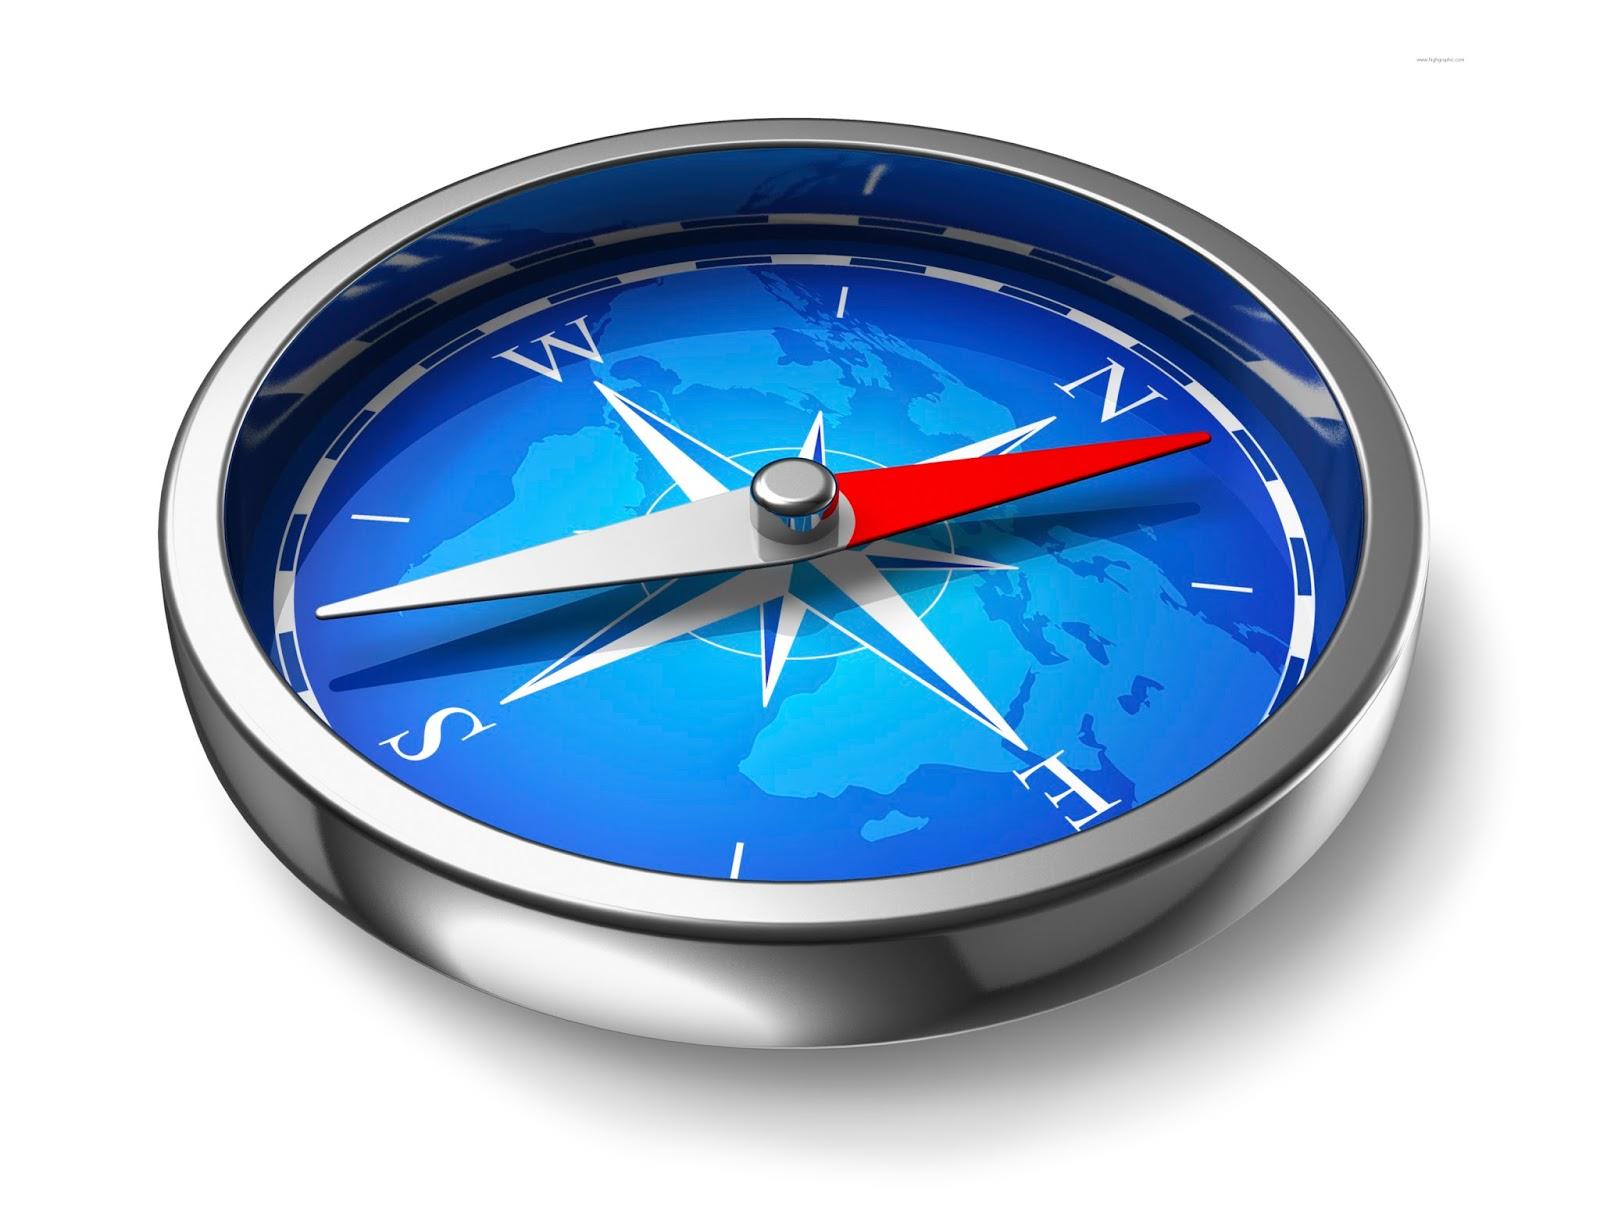 compass - photo #39